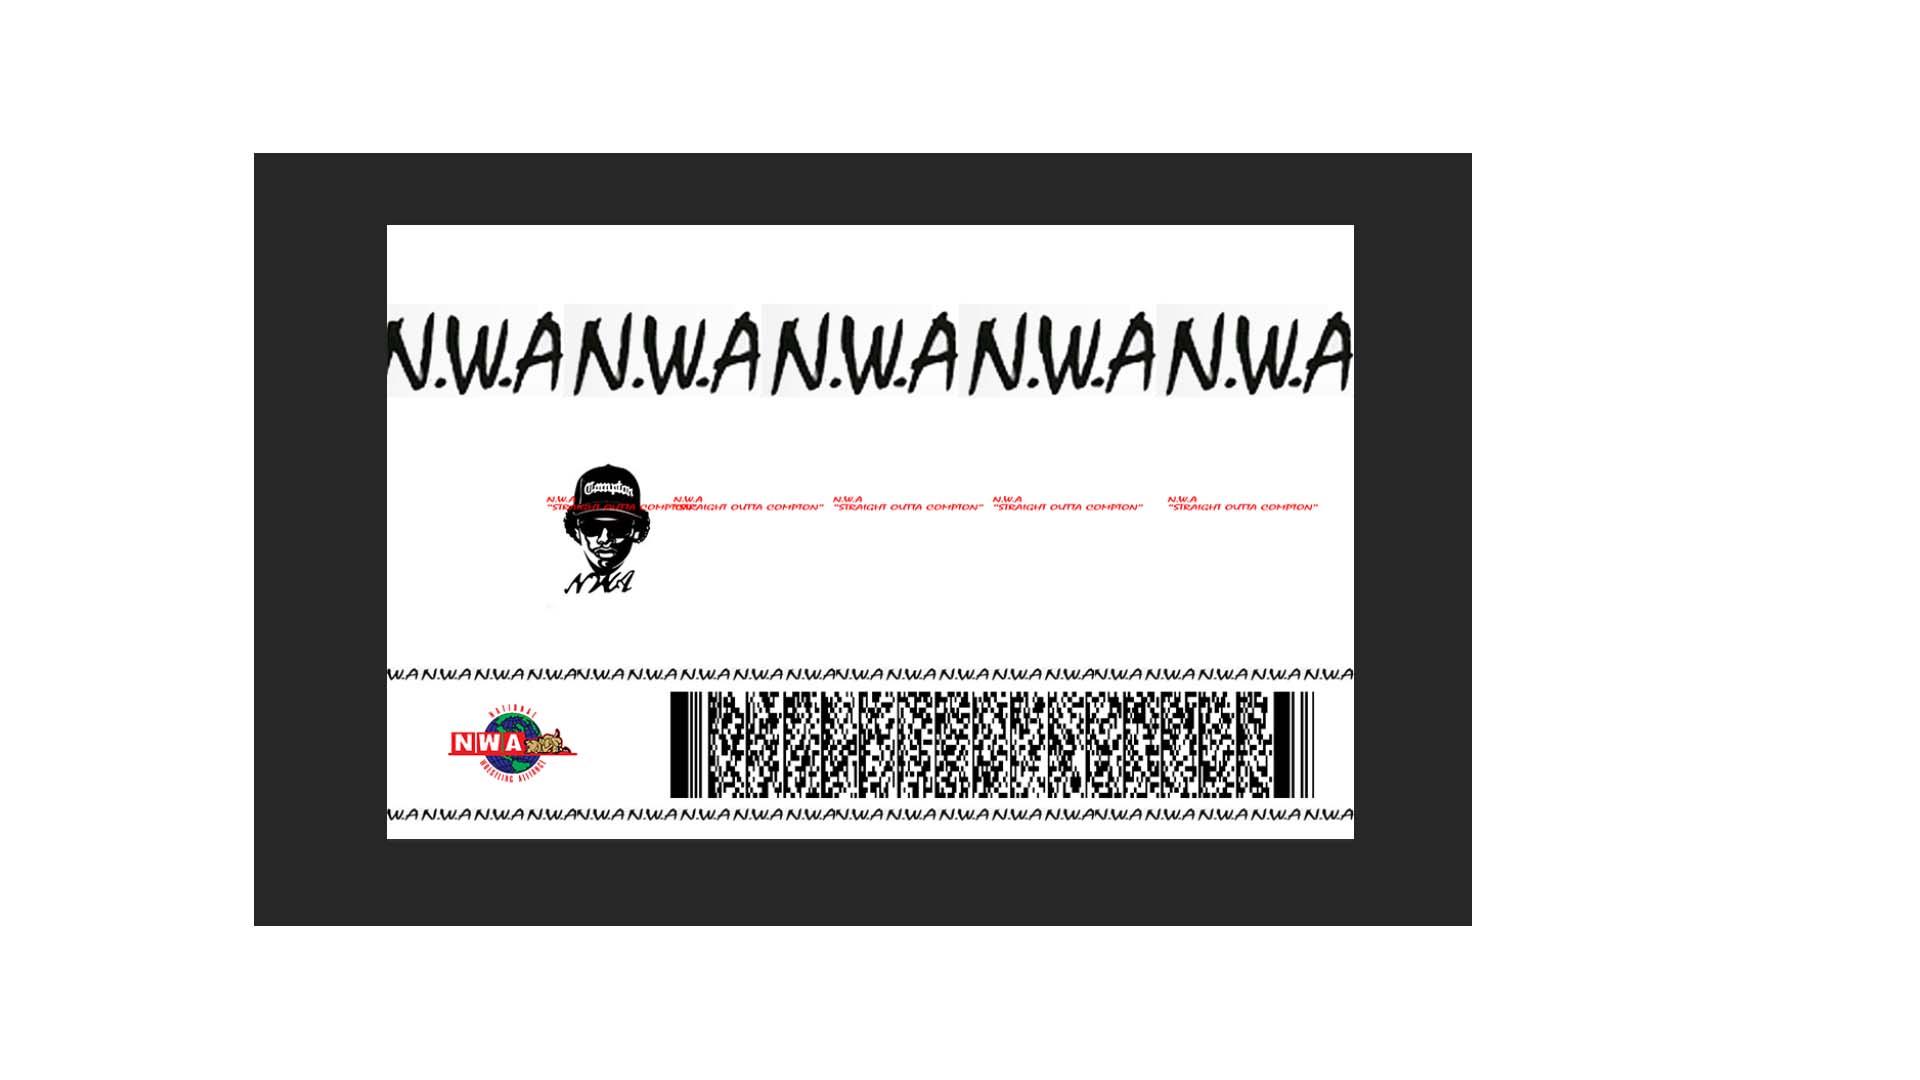 nWAback.jpg